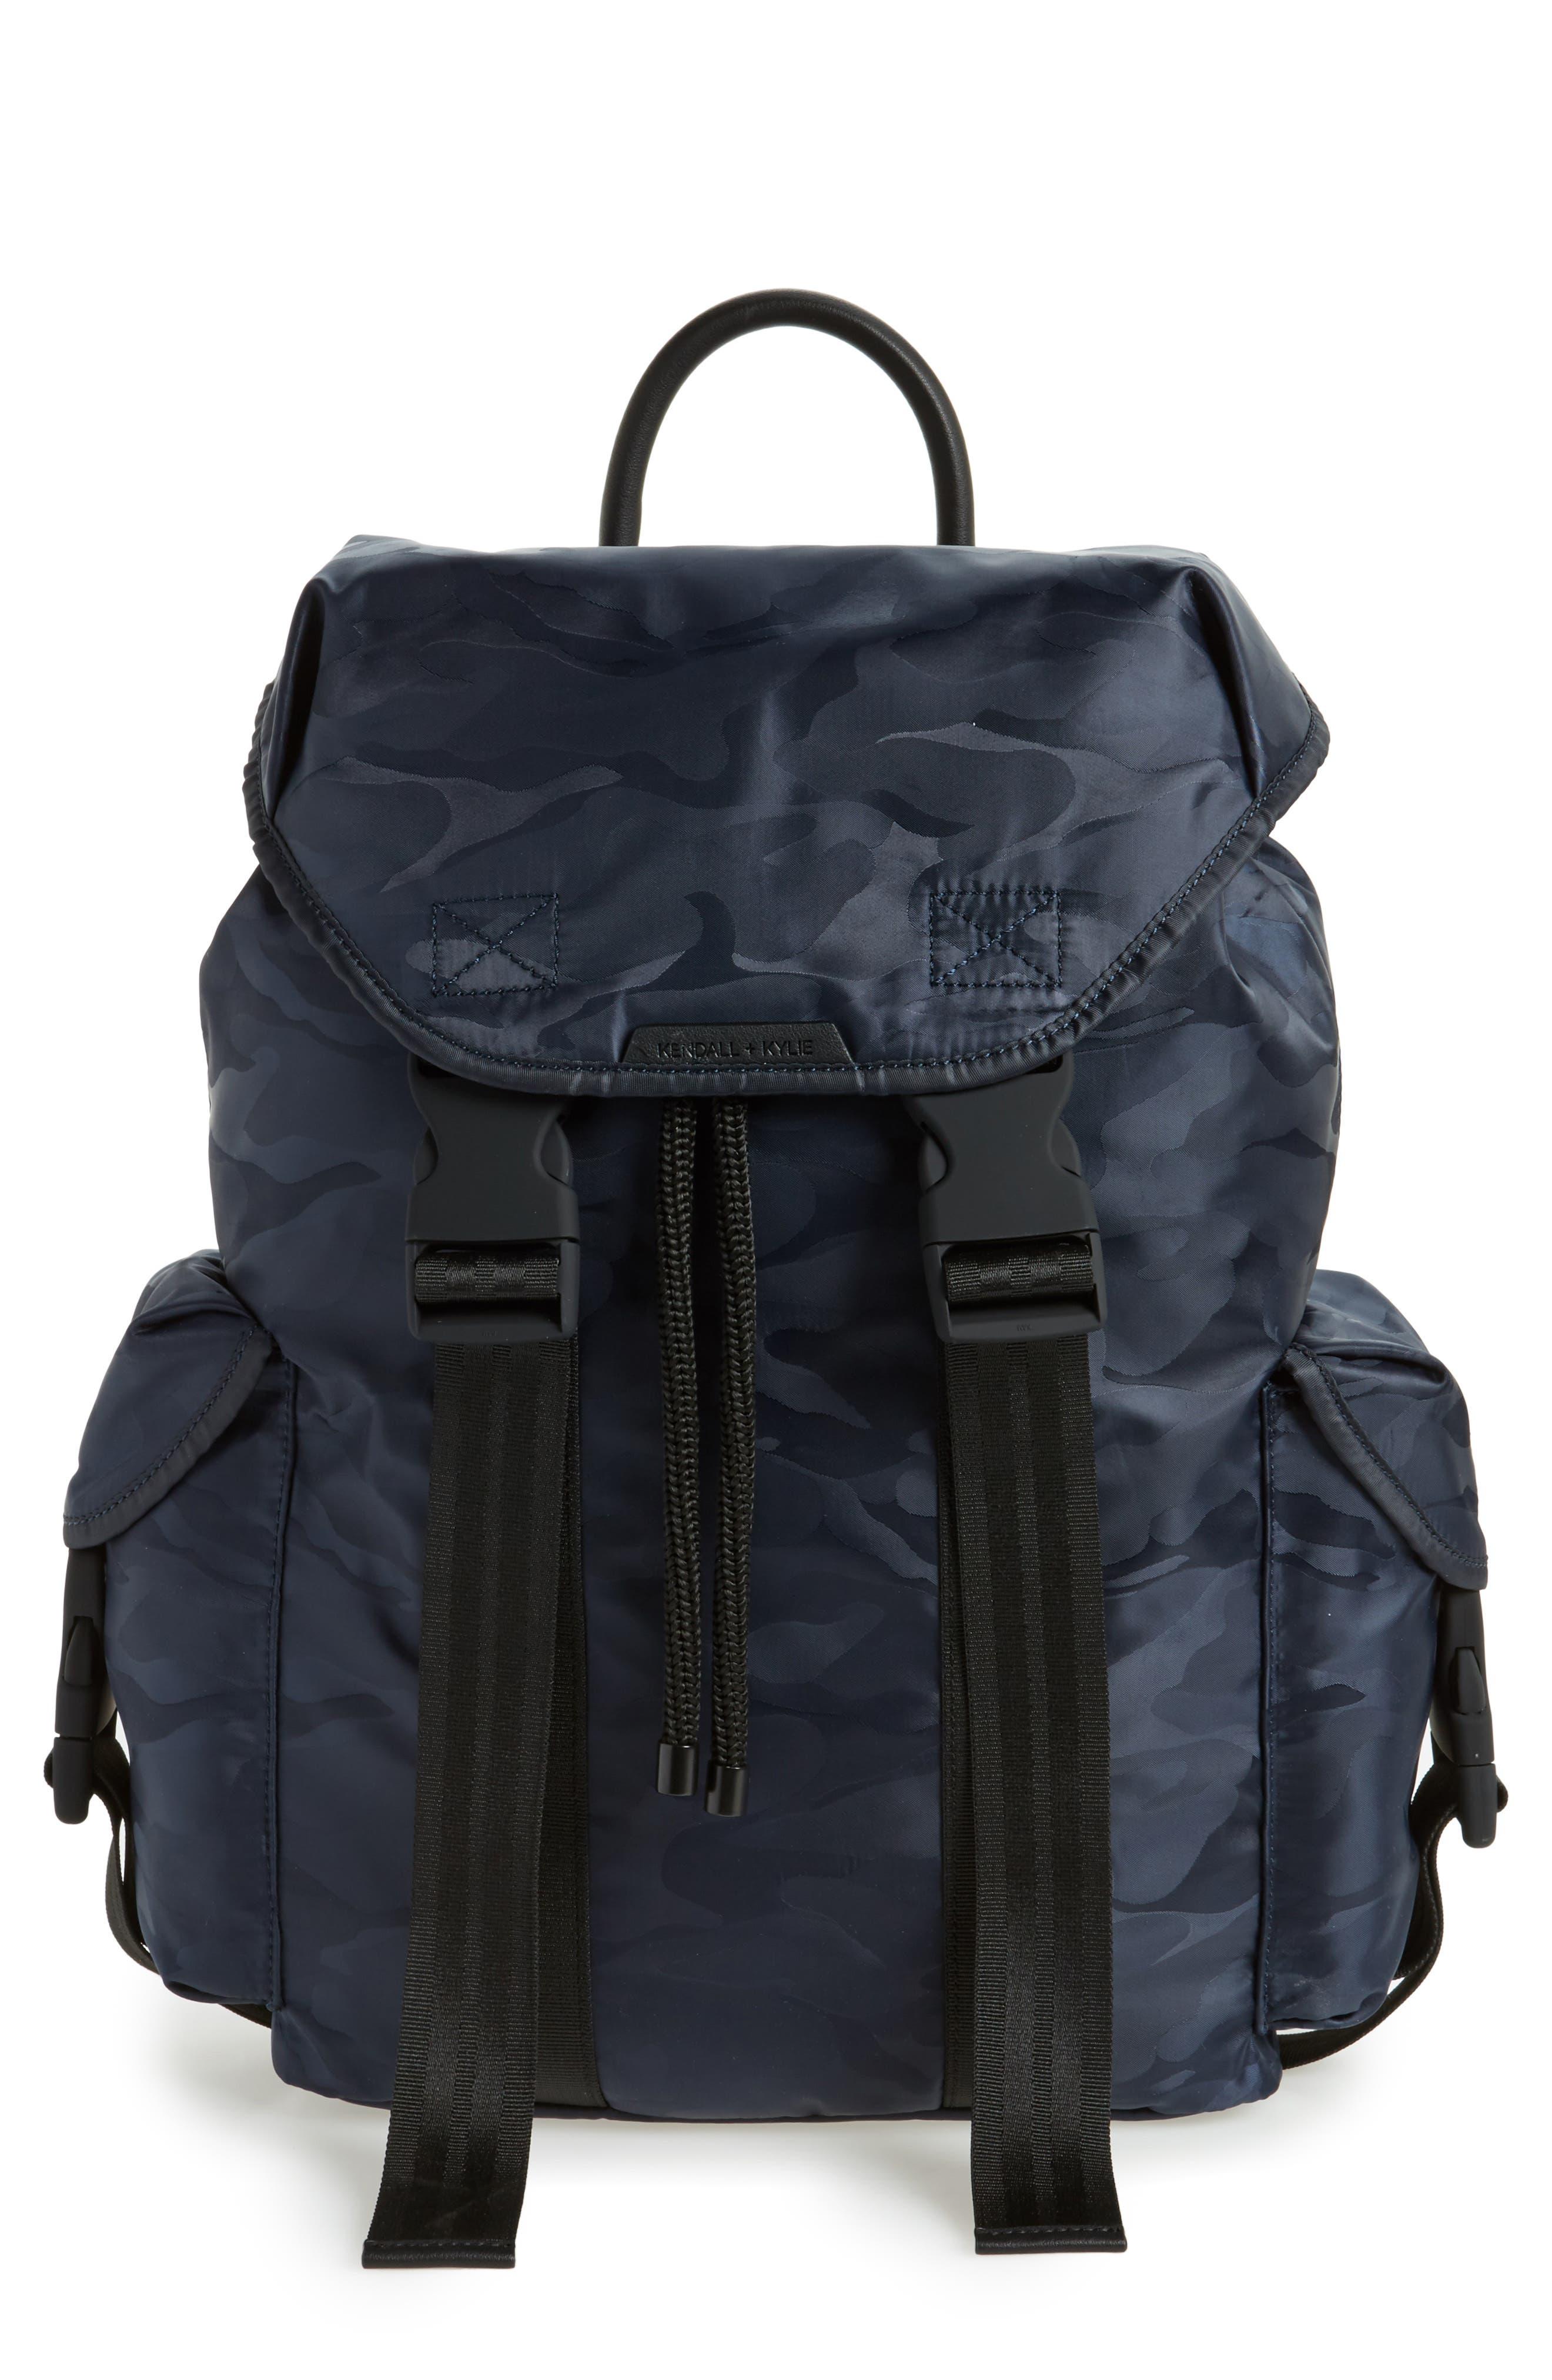 Alternate Image 1 Selected - KENDALL + KYLIE Jordyn Nylon Backpack